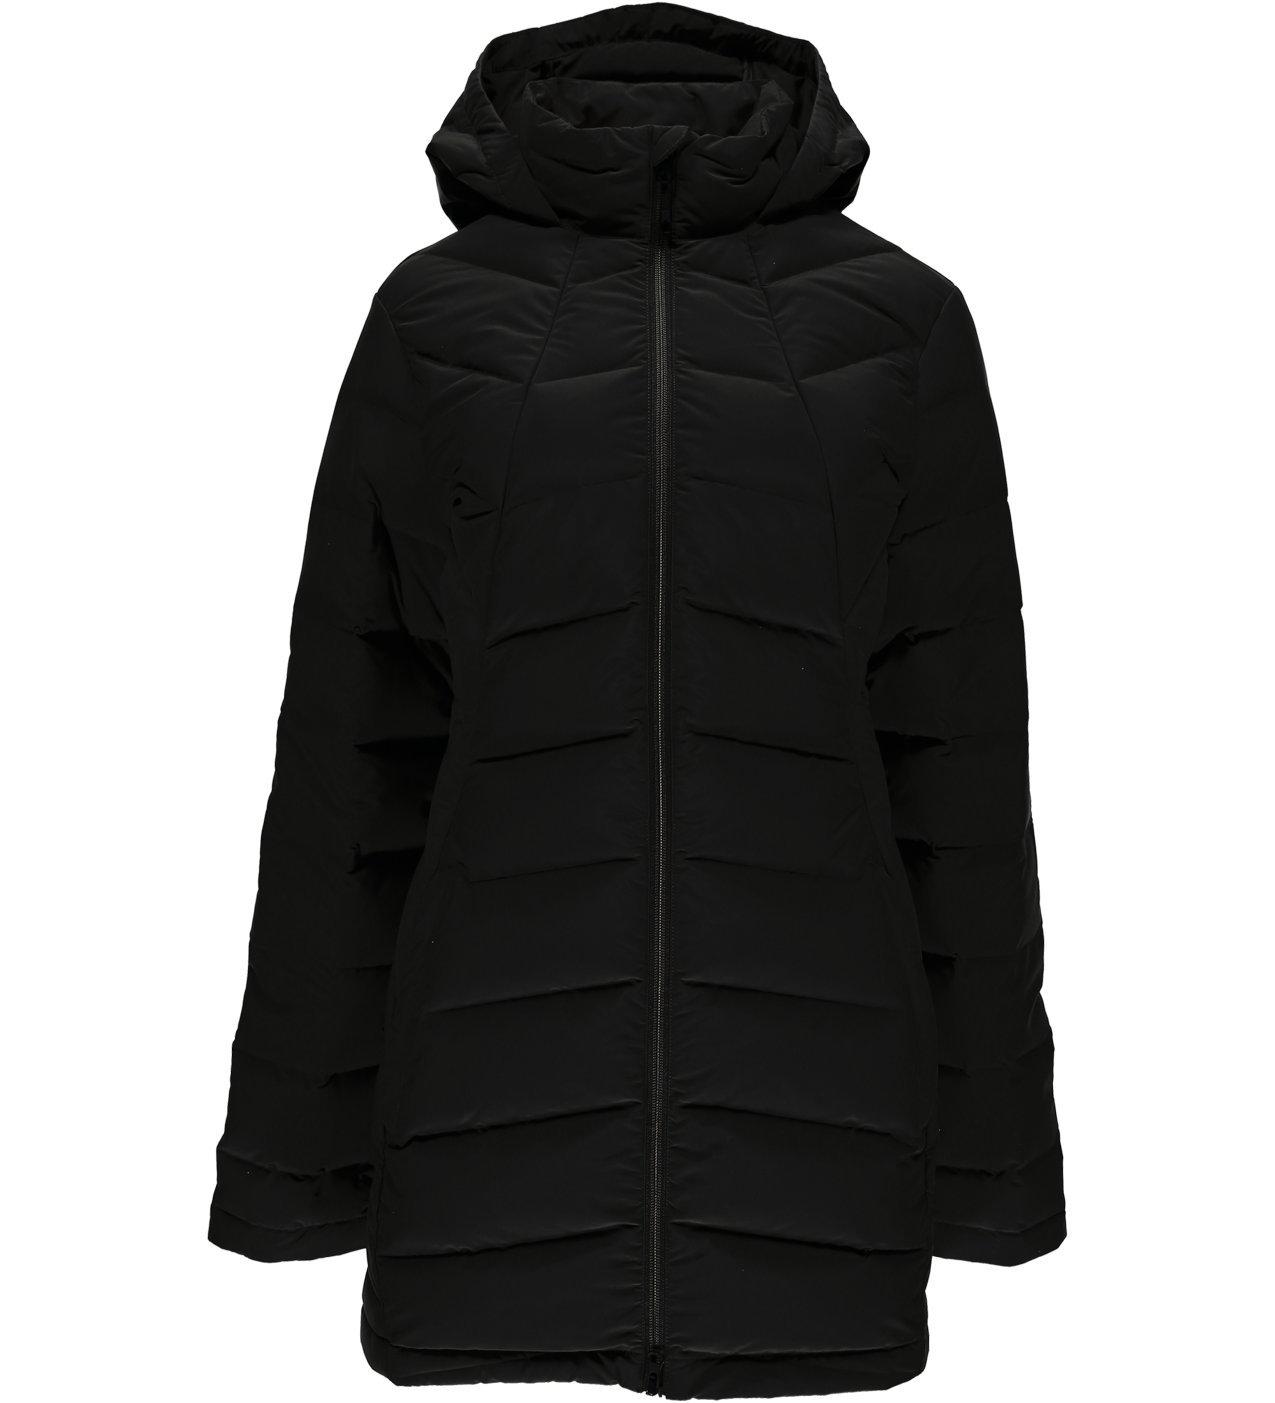 Black Spyder Women's Syrround Long Down Jacket